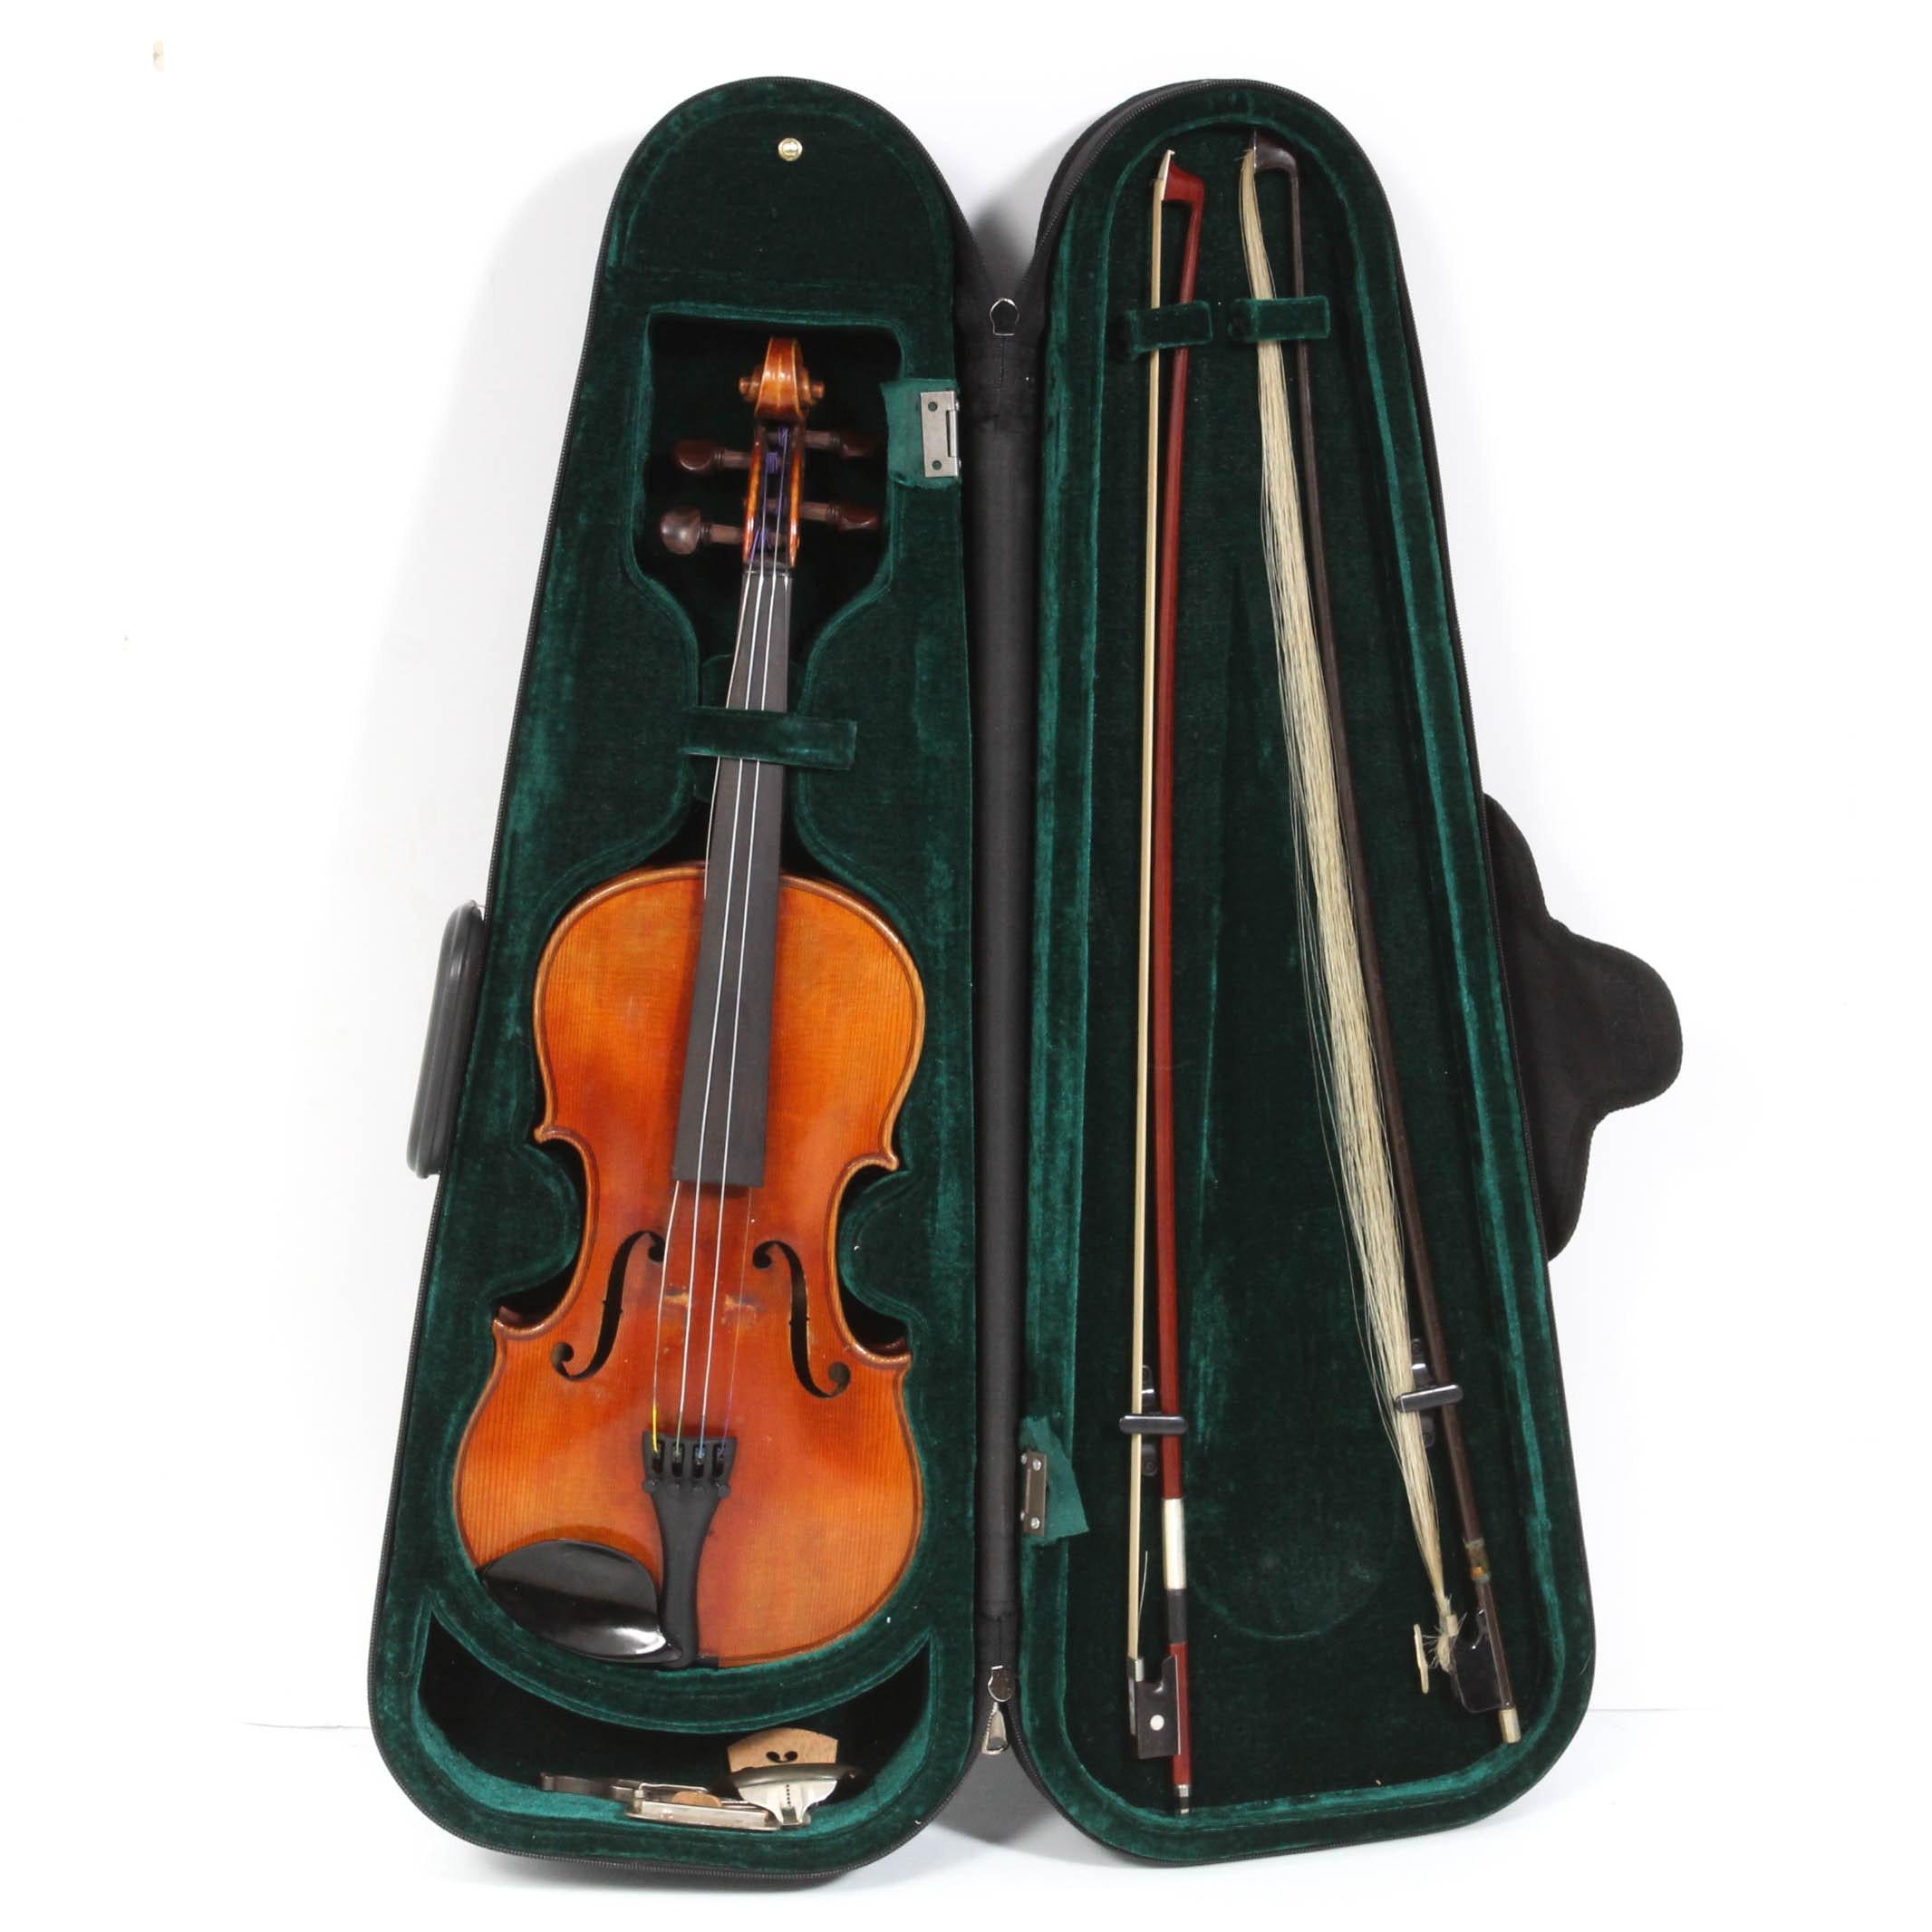 Reproduction Stradivarius Violin